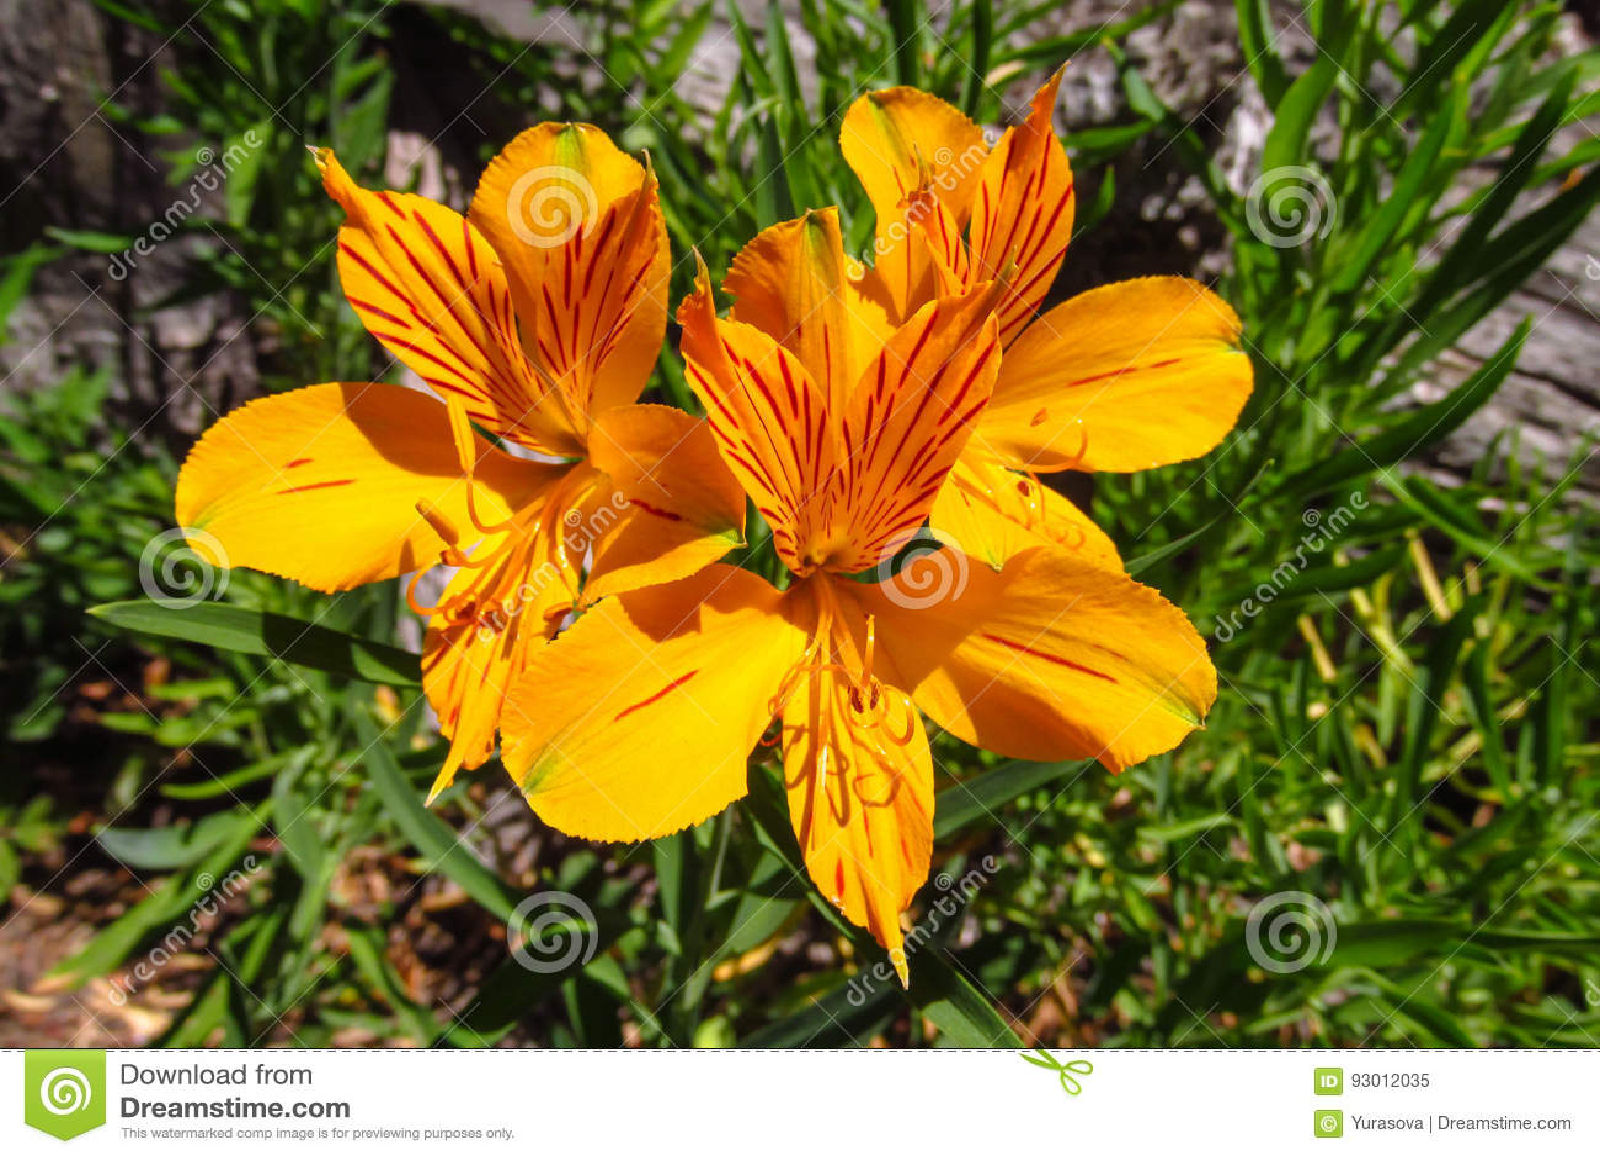 Alstroemeria Flower Peruvian Lily Orange Flower Stock Image Image